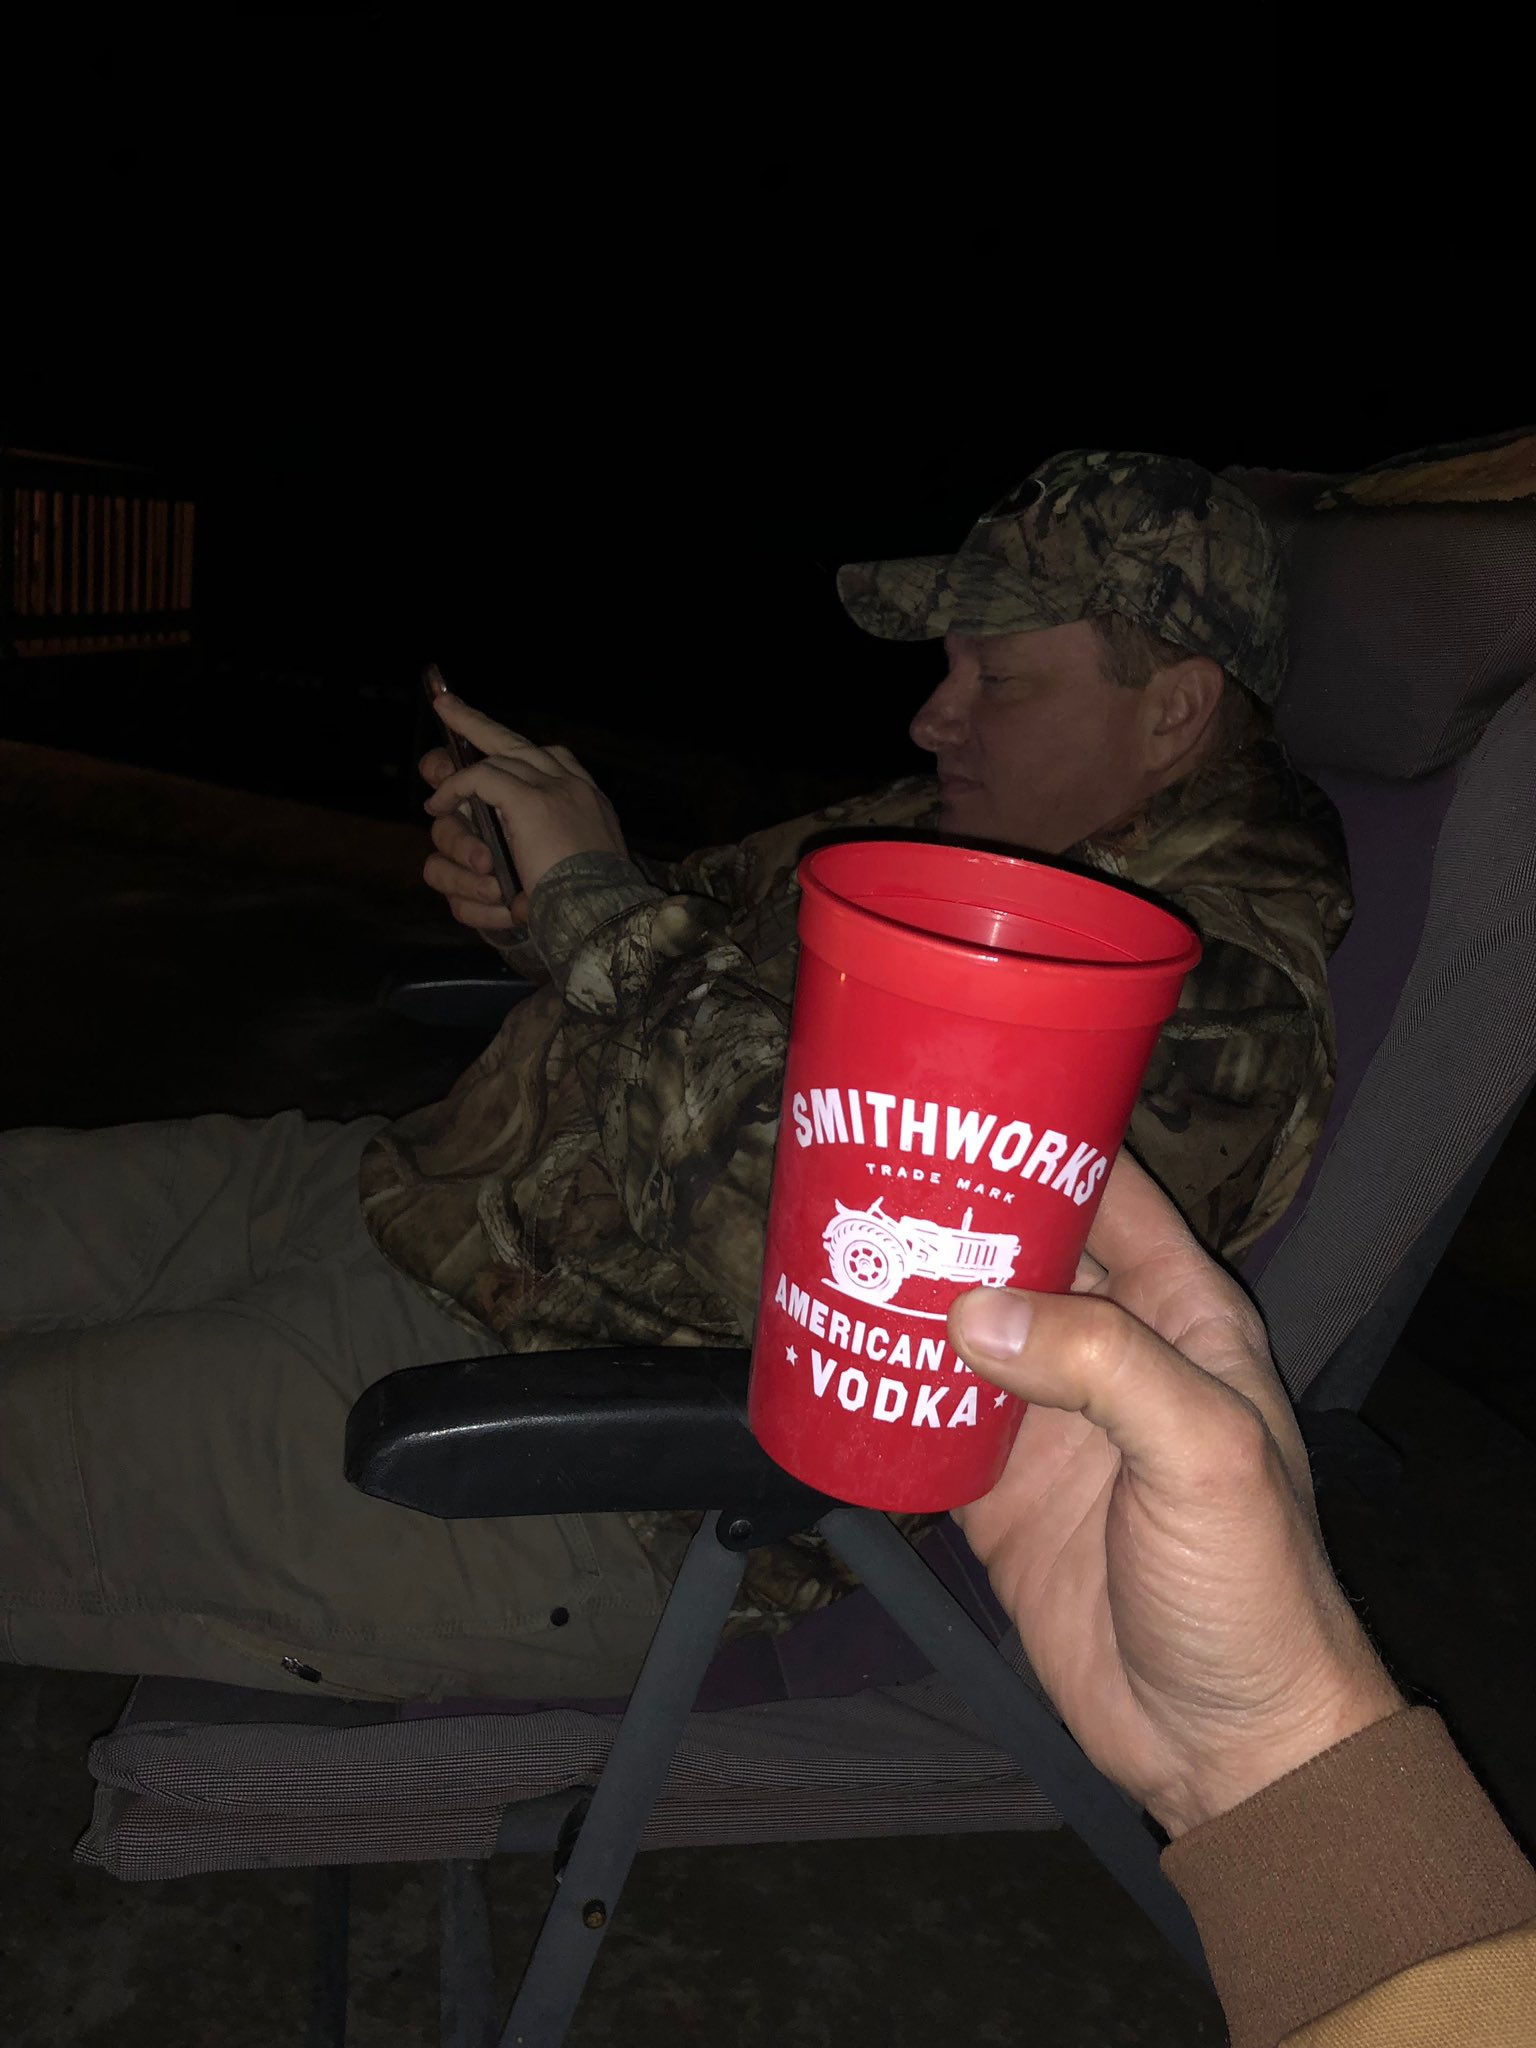 Campfire with my ol' dipshit moron idiot good buddy @MattMorrett.. https://t.co/rX58sQGd34